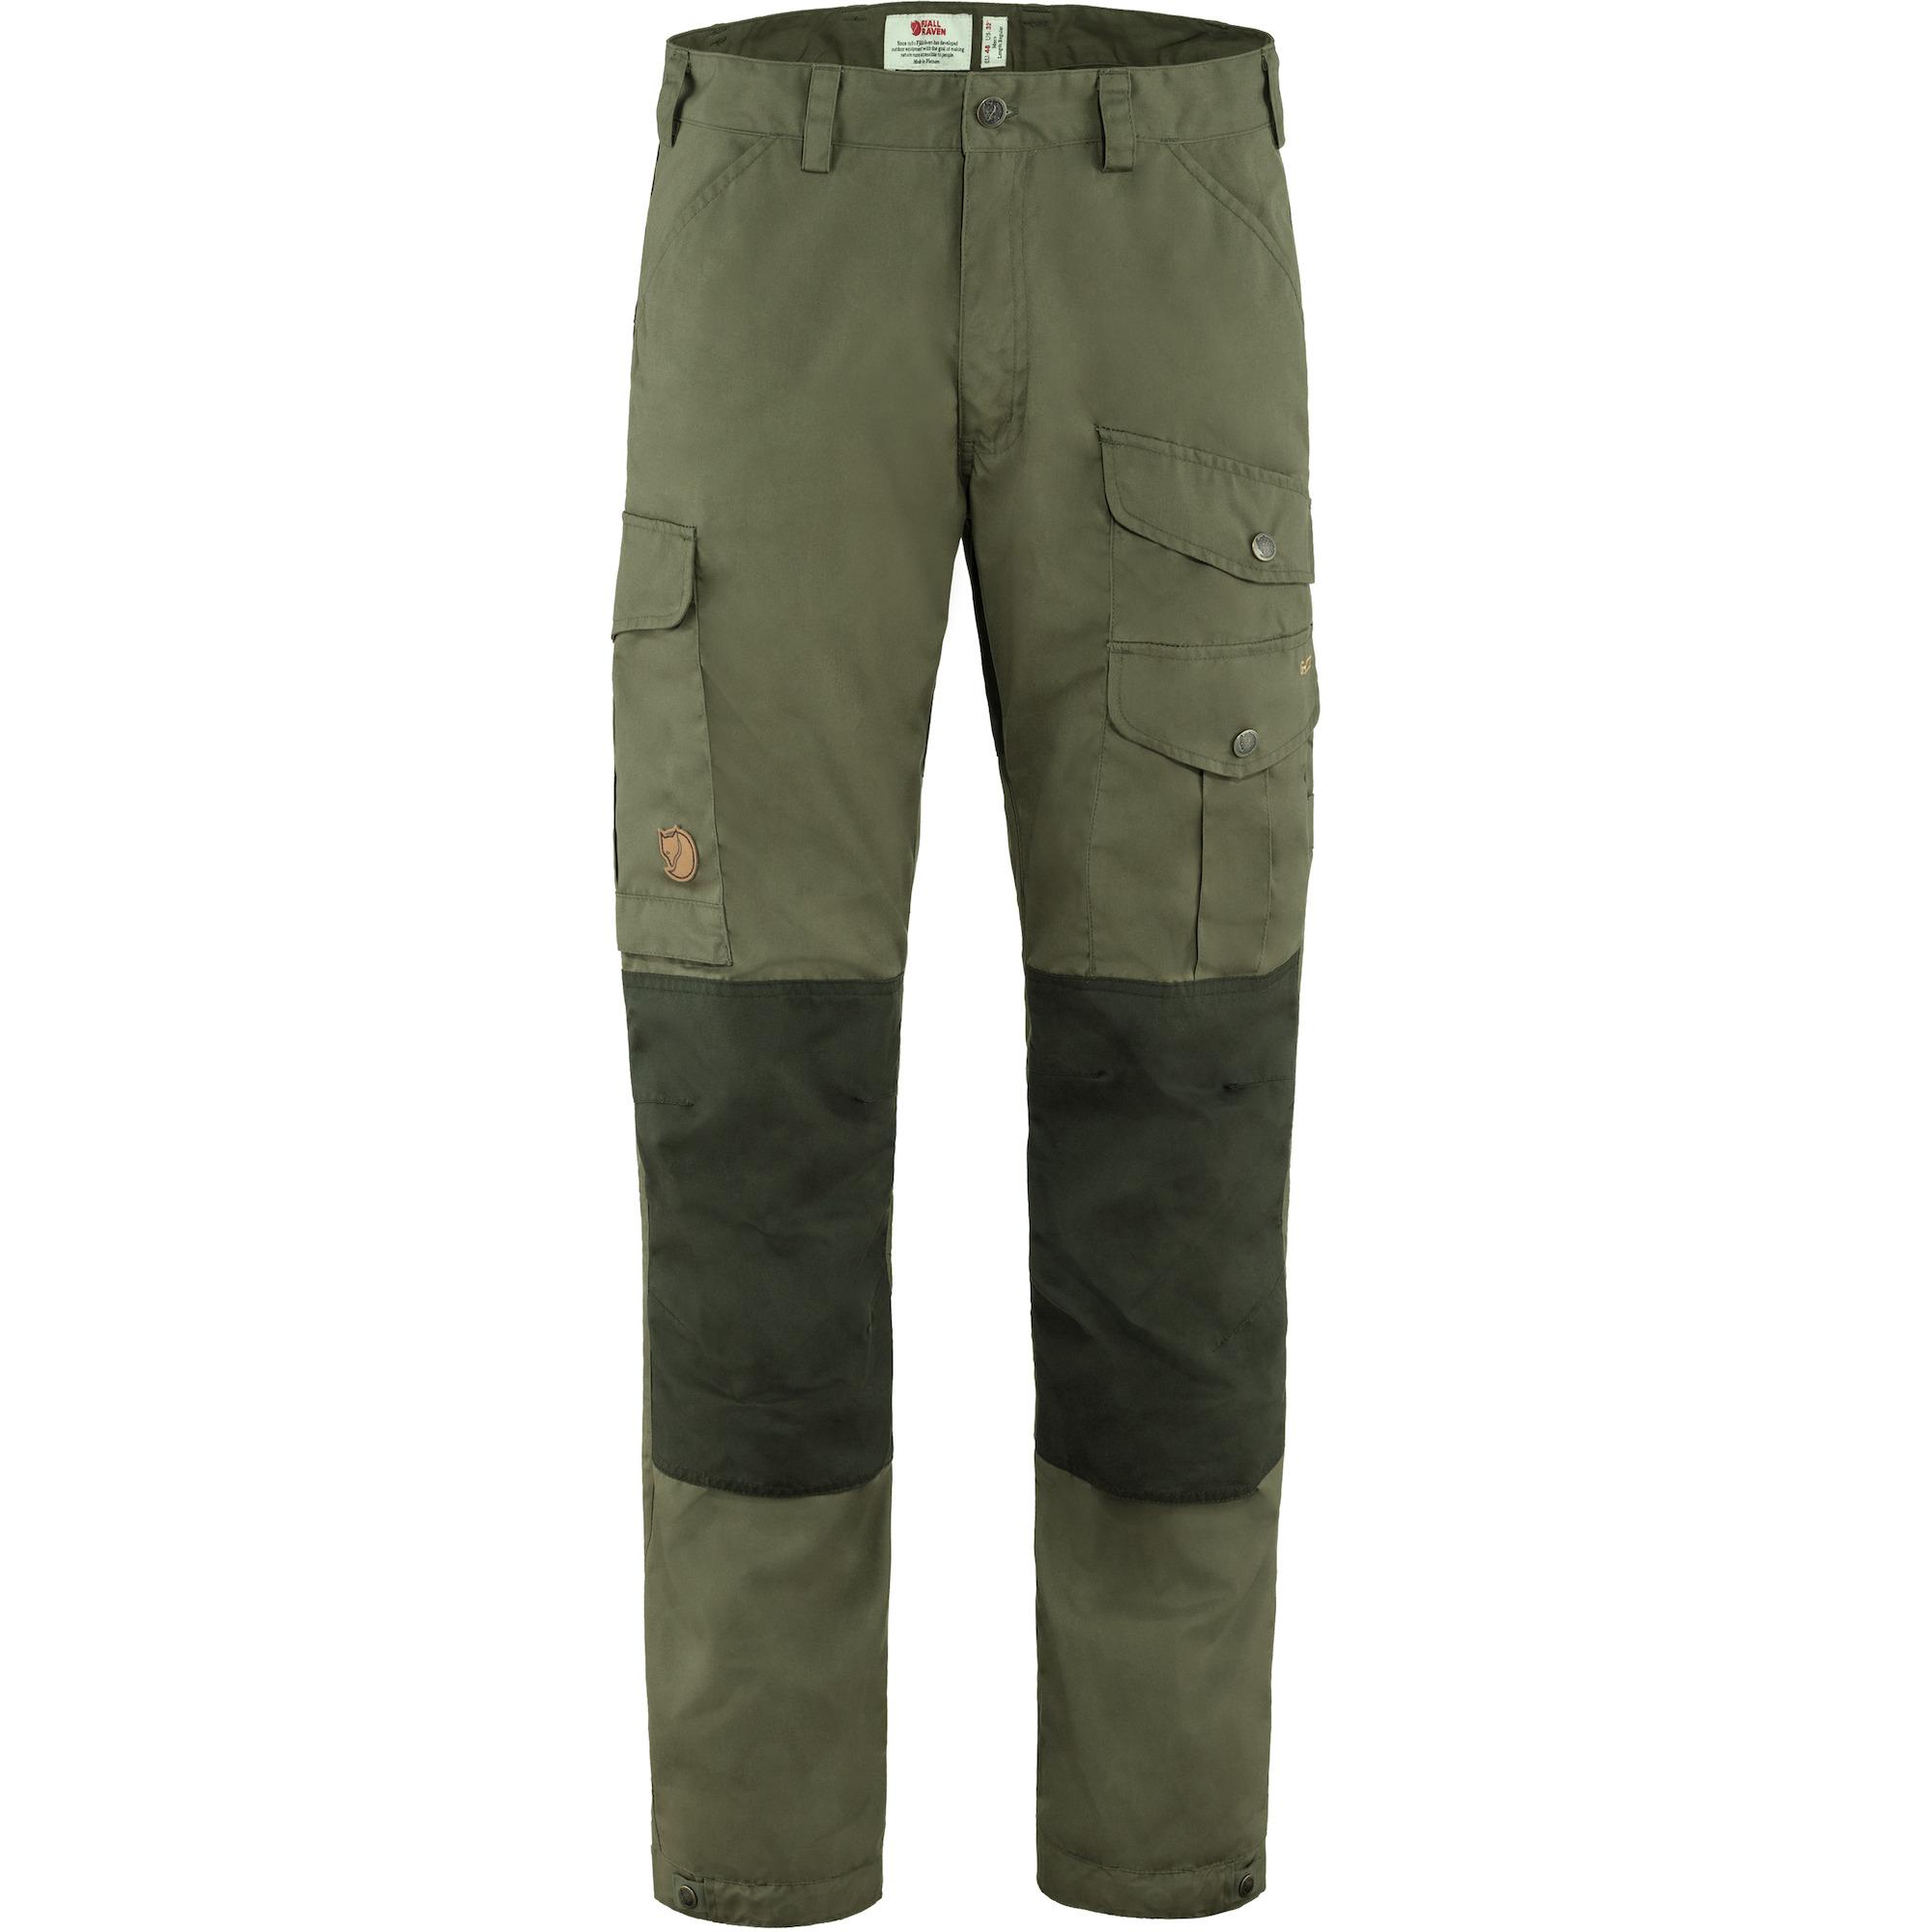 Fjällräven Vidda Pro Trouser// Hose R Strapazierfähige Trekkinghose